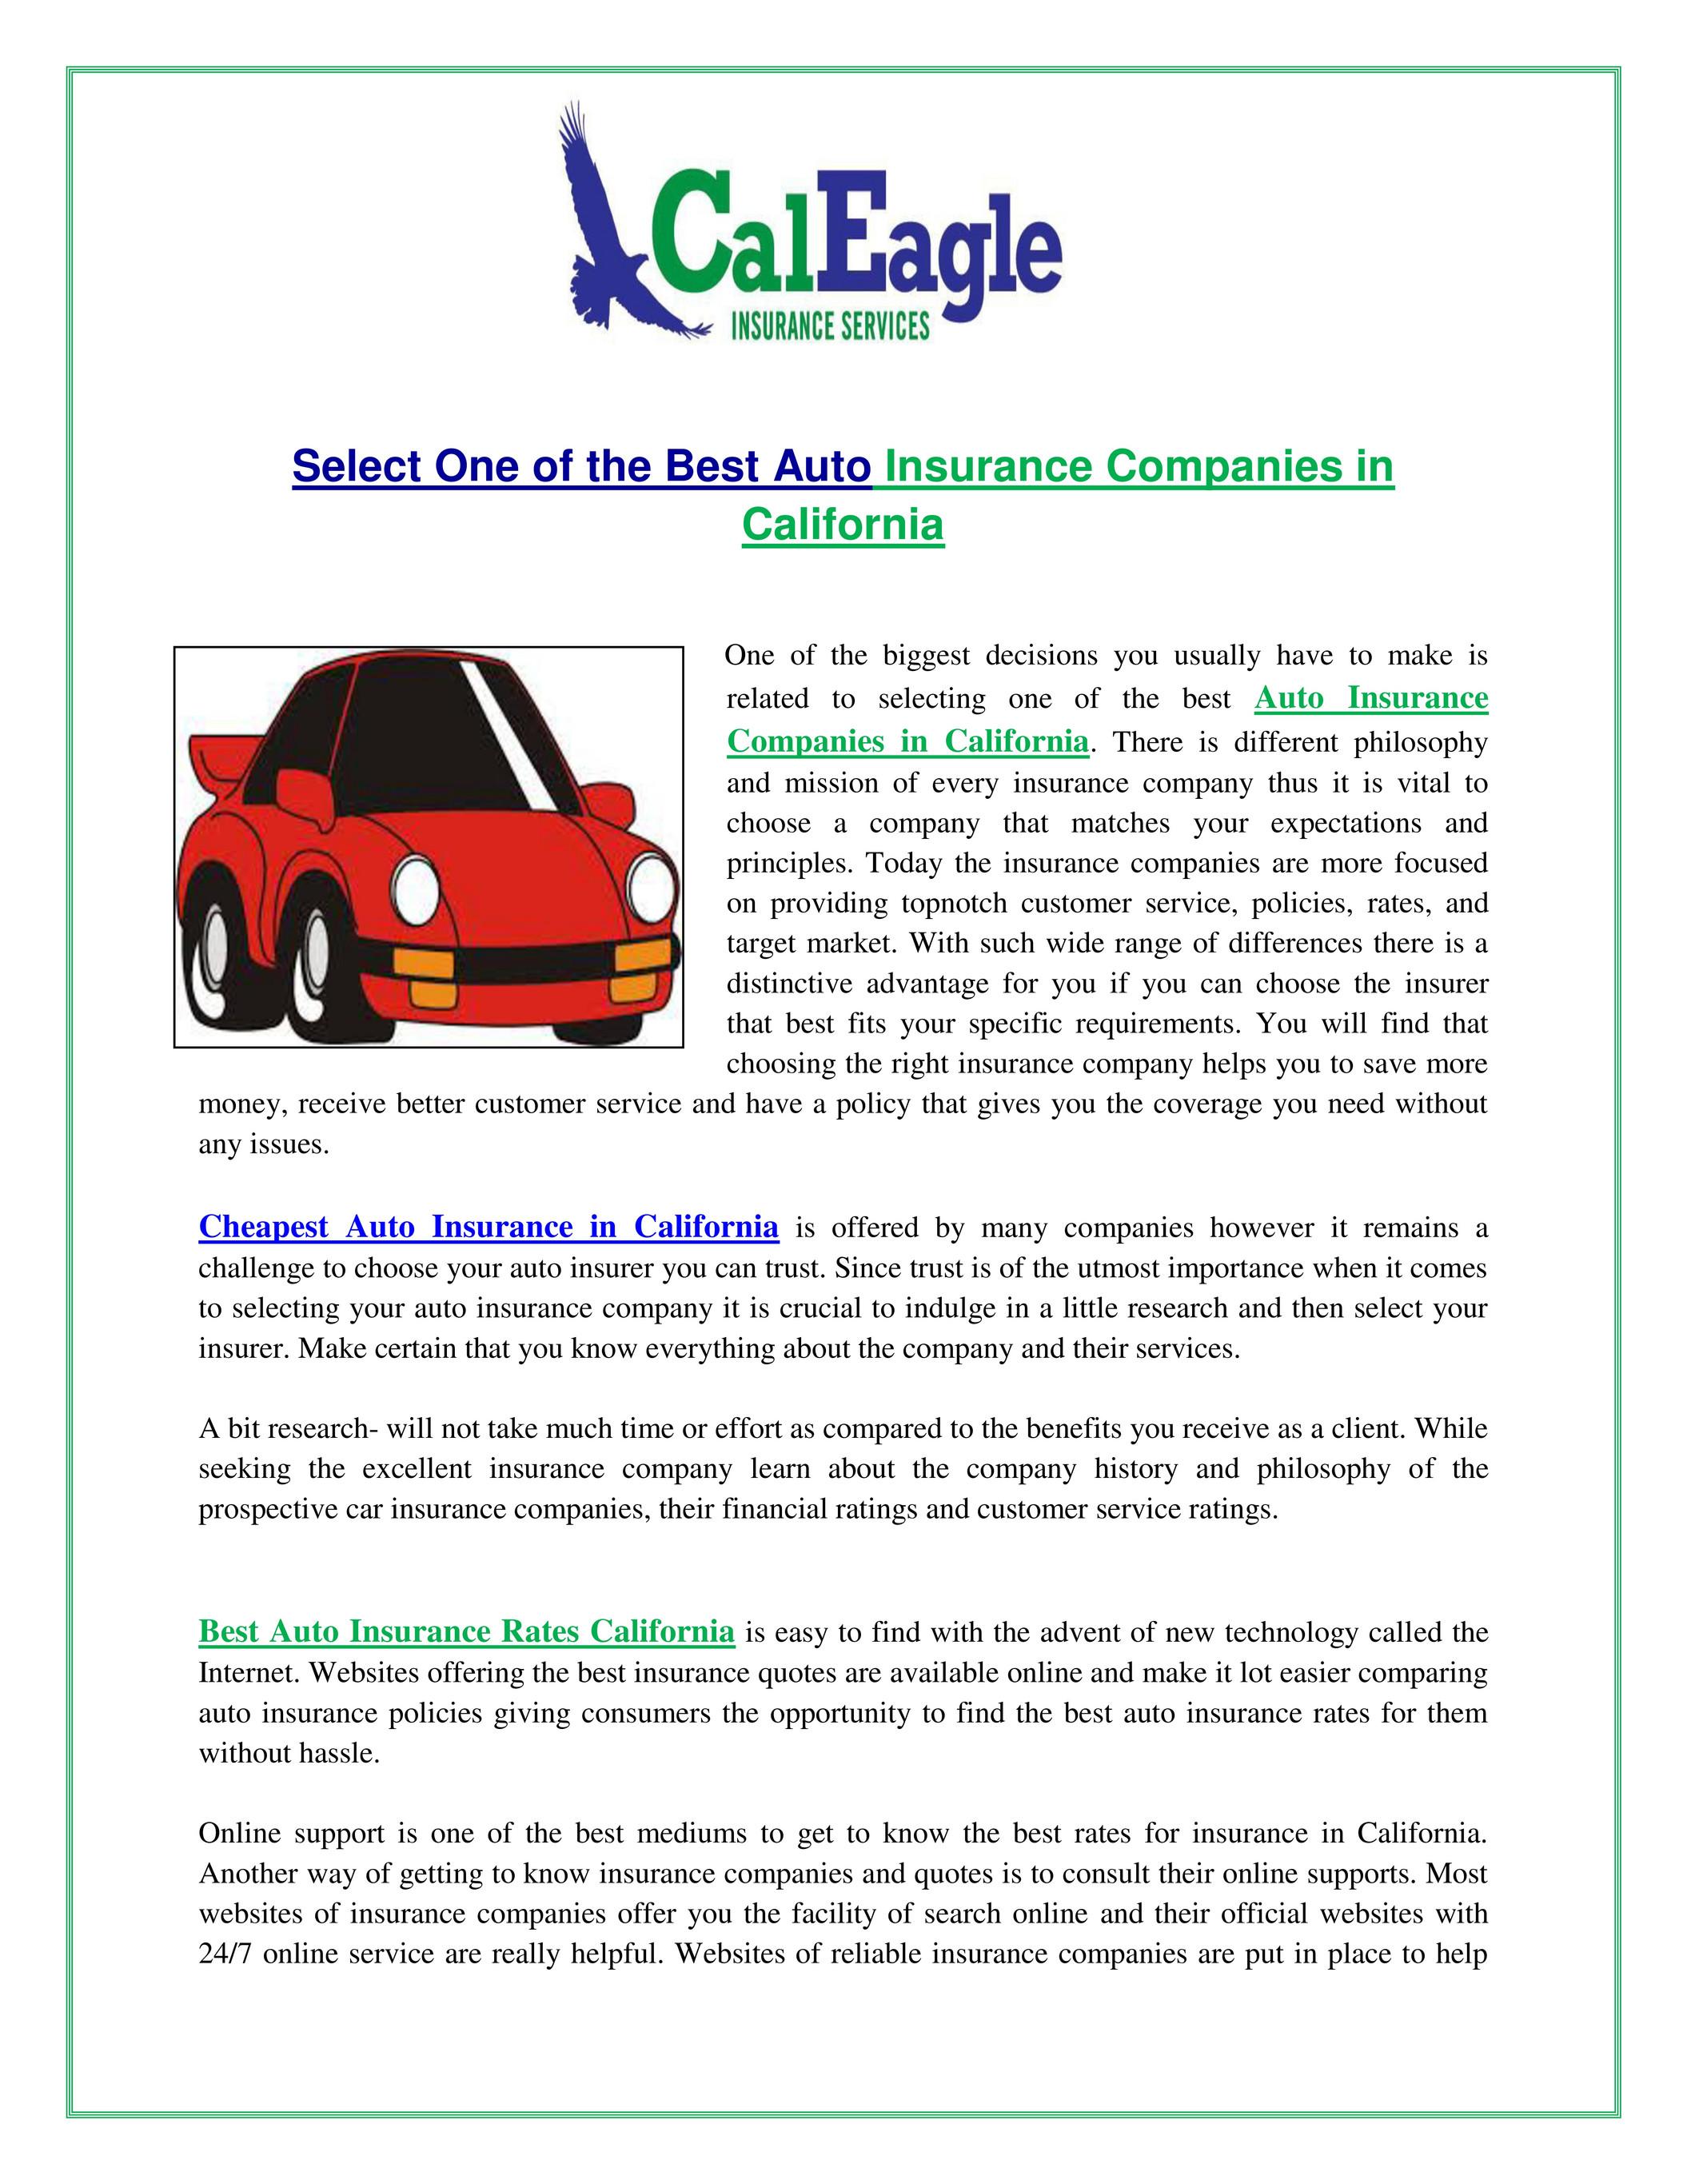 Caleagleinsurance Com Auto Insurance Companies In California Page 1 Created With Publitas Com